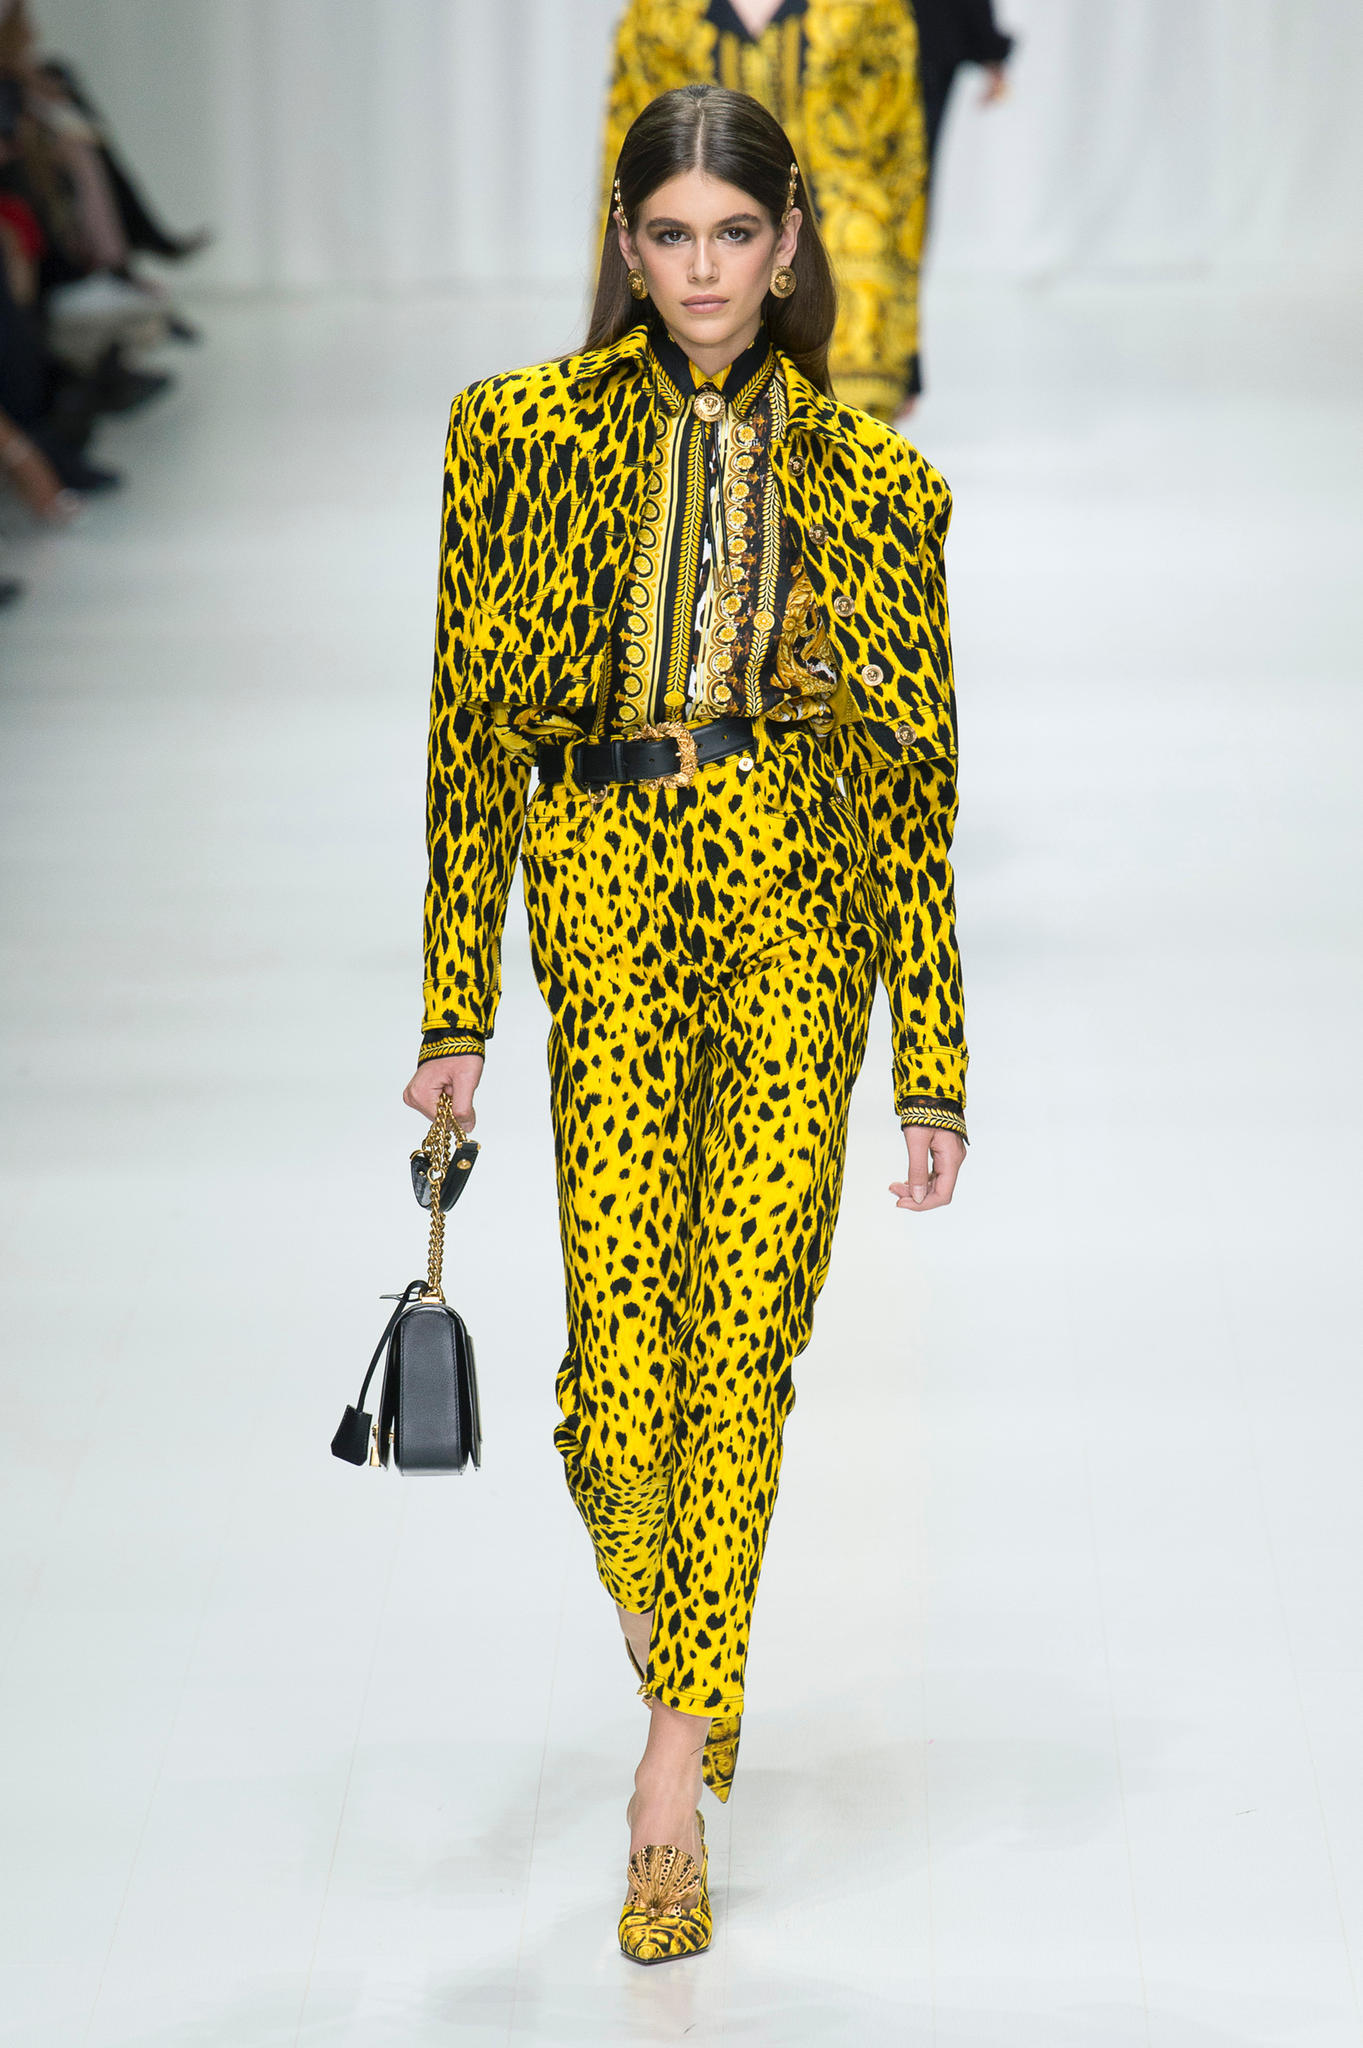 Paris Fashion Week Outfits